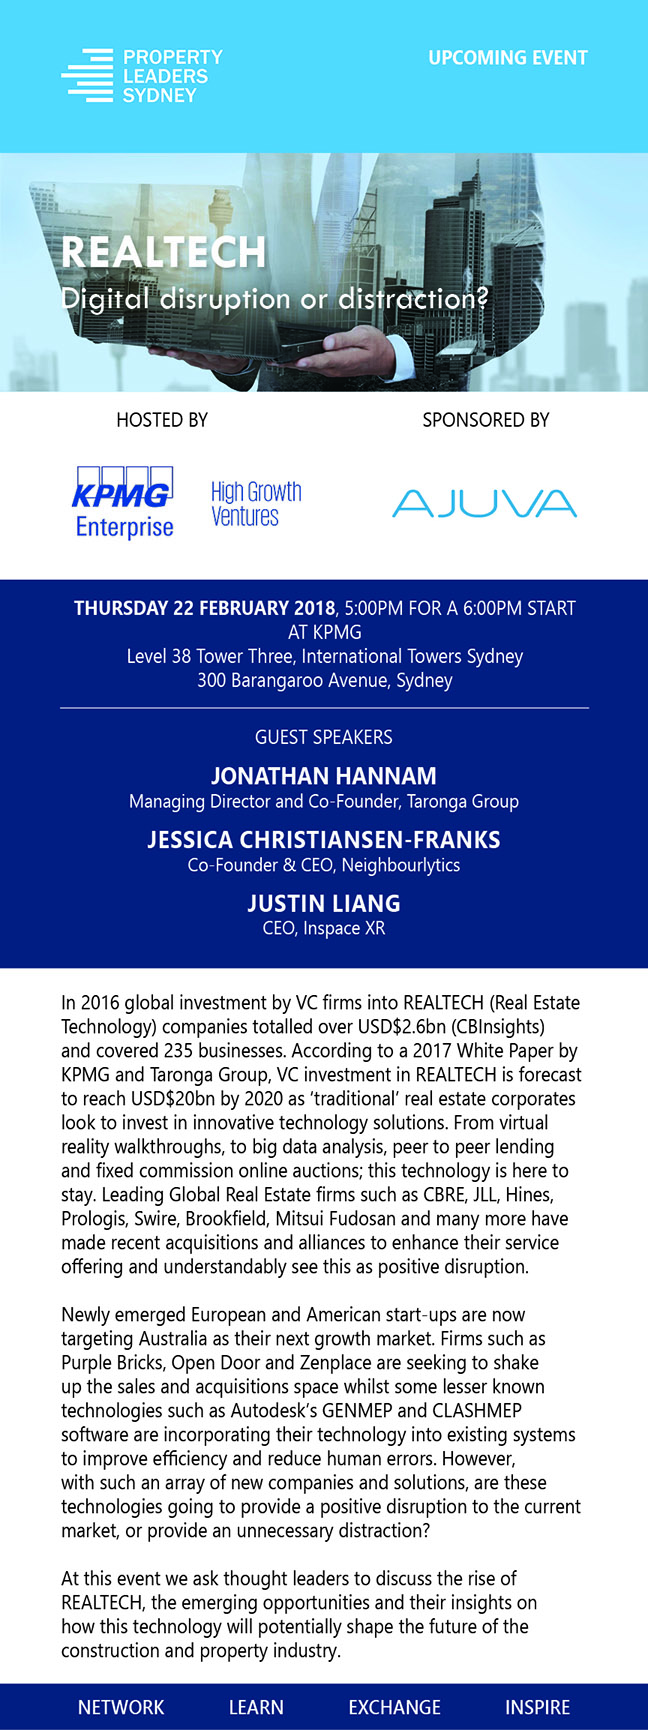 Property Leaders Sydney, event host KPMG and sponsor AJUVA present REALTECH: Digital Disruption or Distraction?